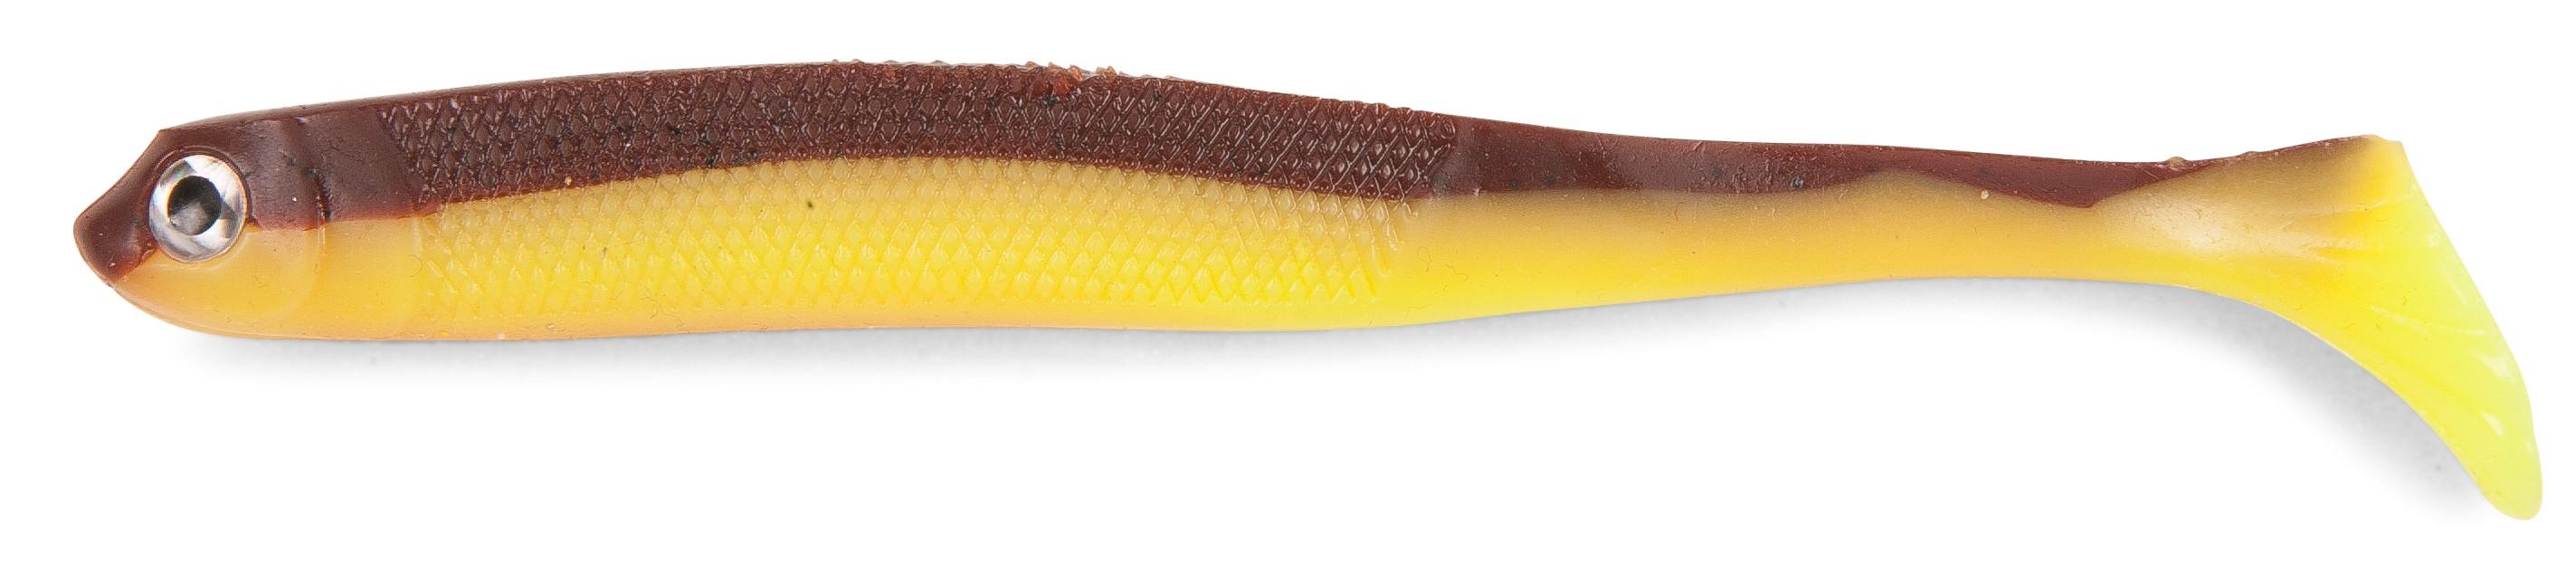 Iron Claw gumová nástraha Slim Jim 16 cm Vzor BC, 3 ks